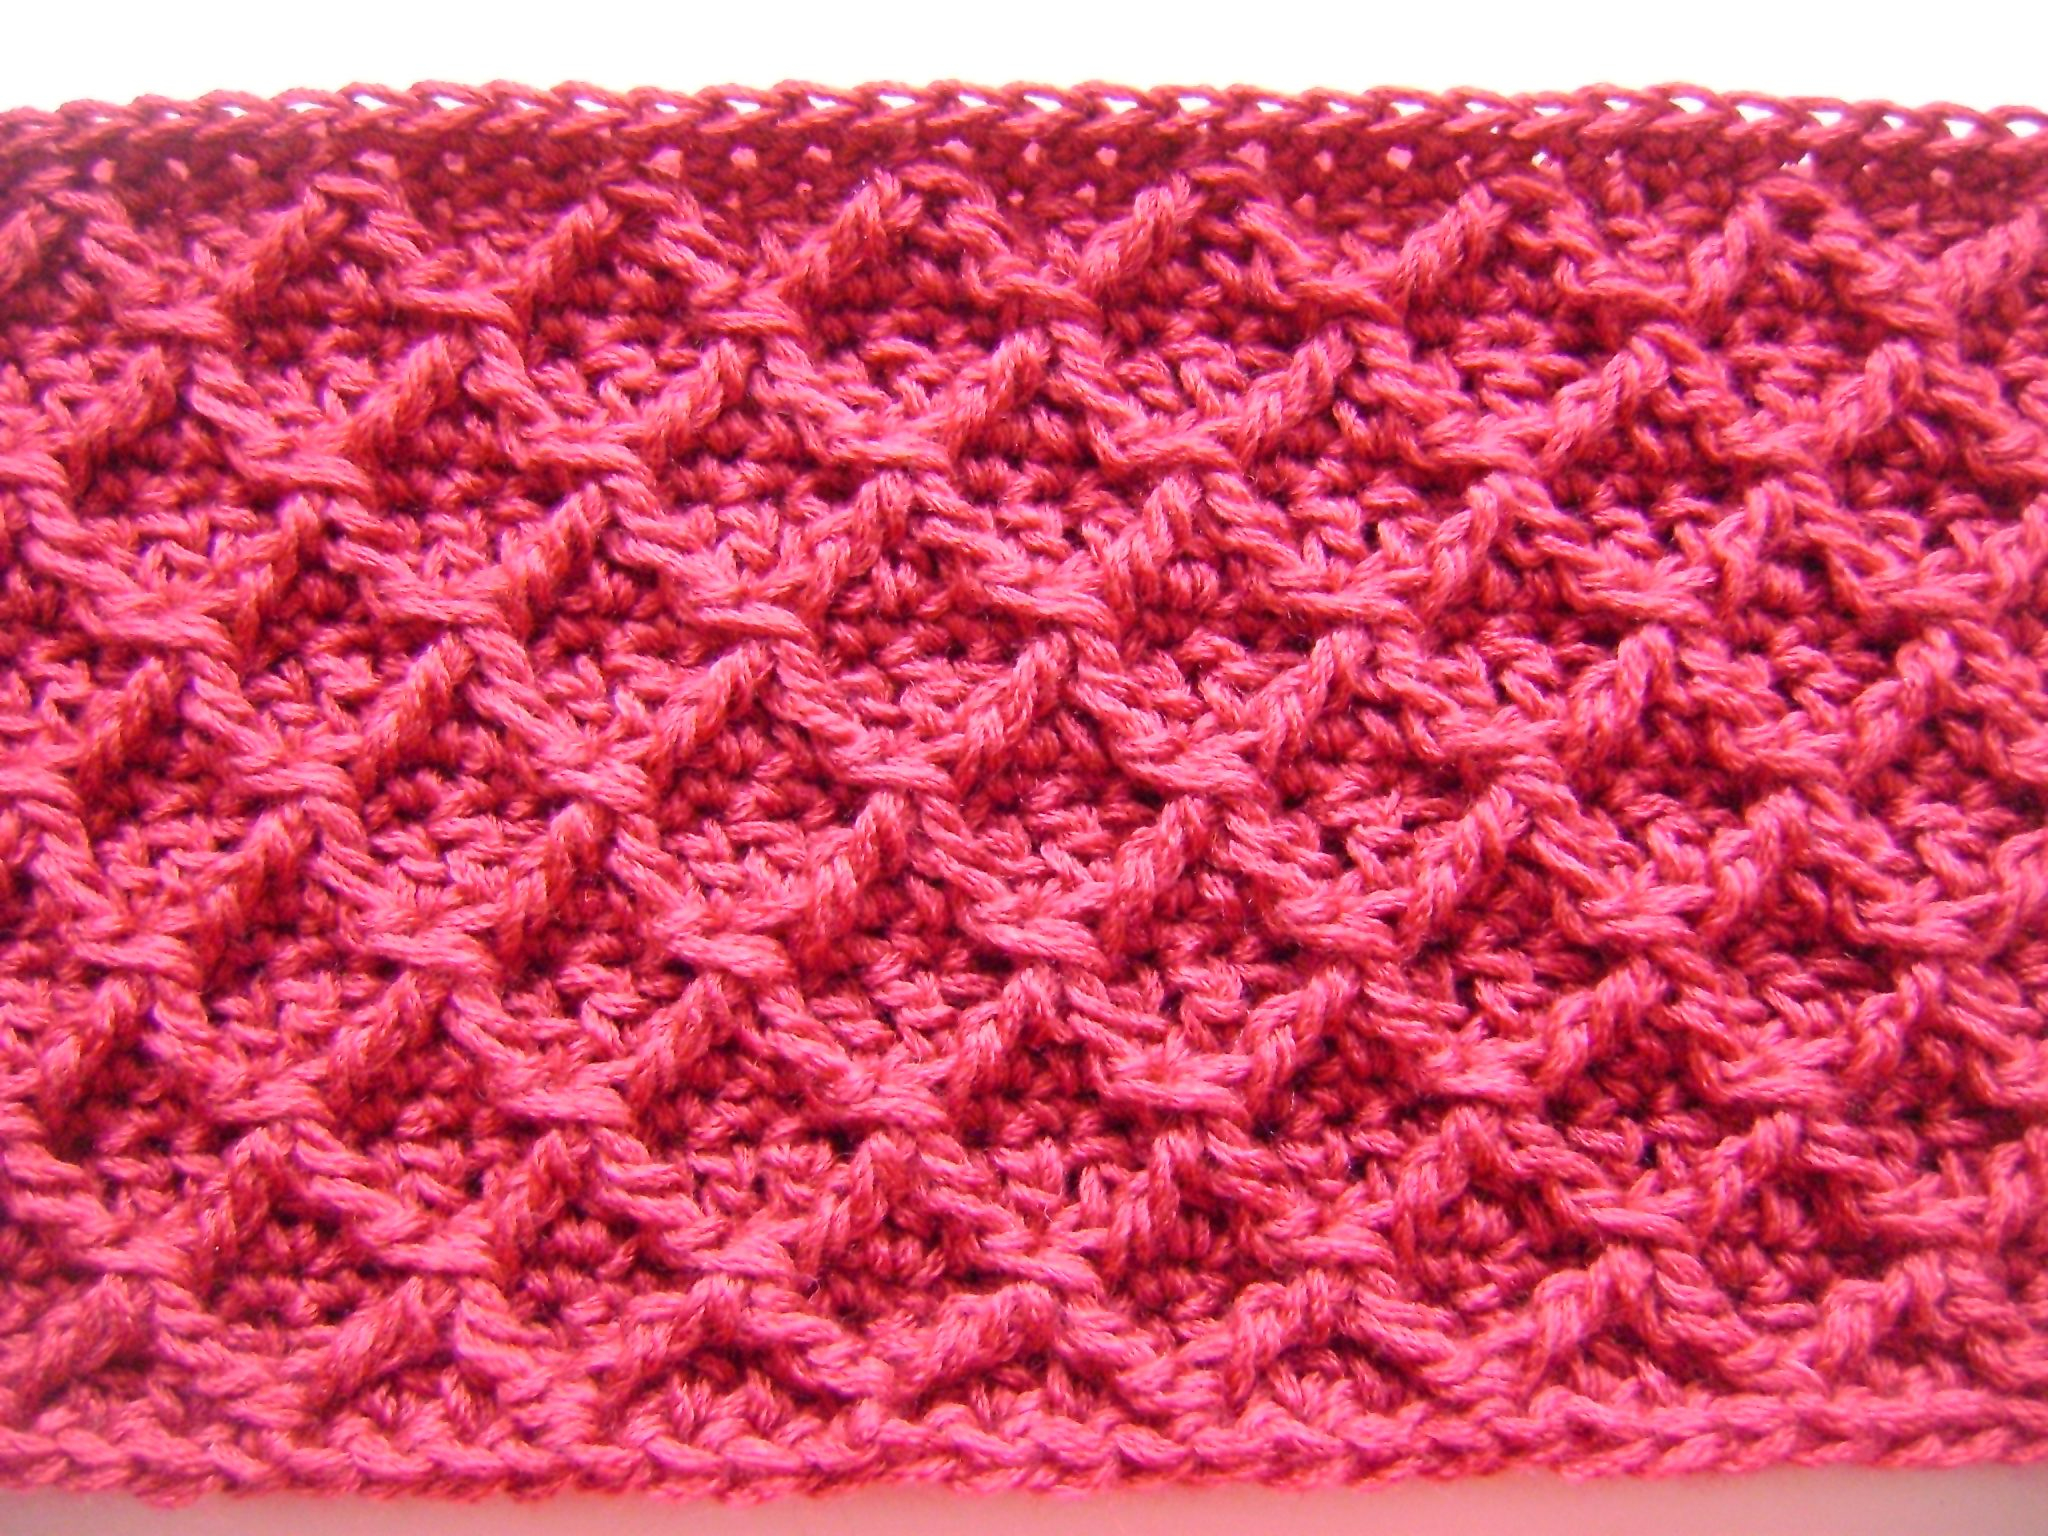 Crochet Diamond Pattern  Free Pattern Diamond Crochet Cowl